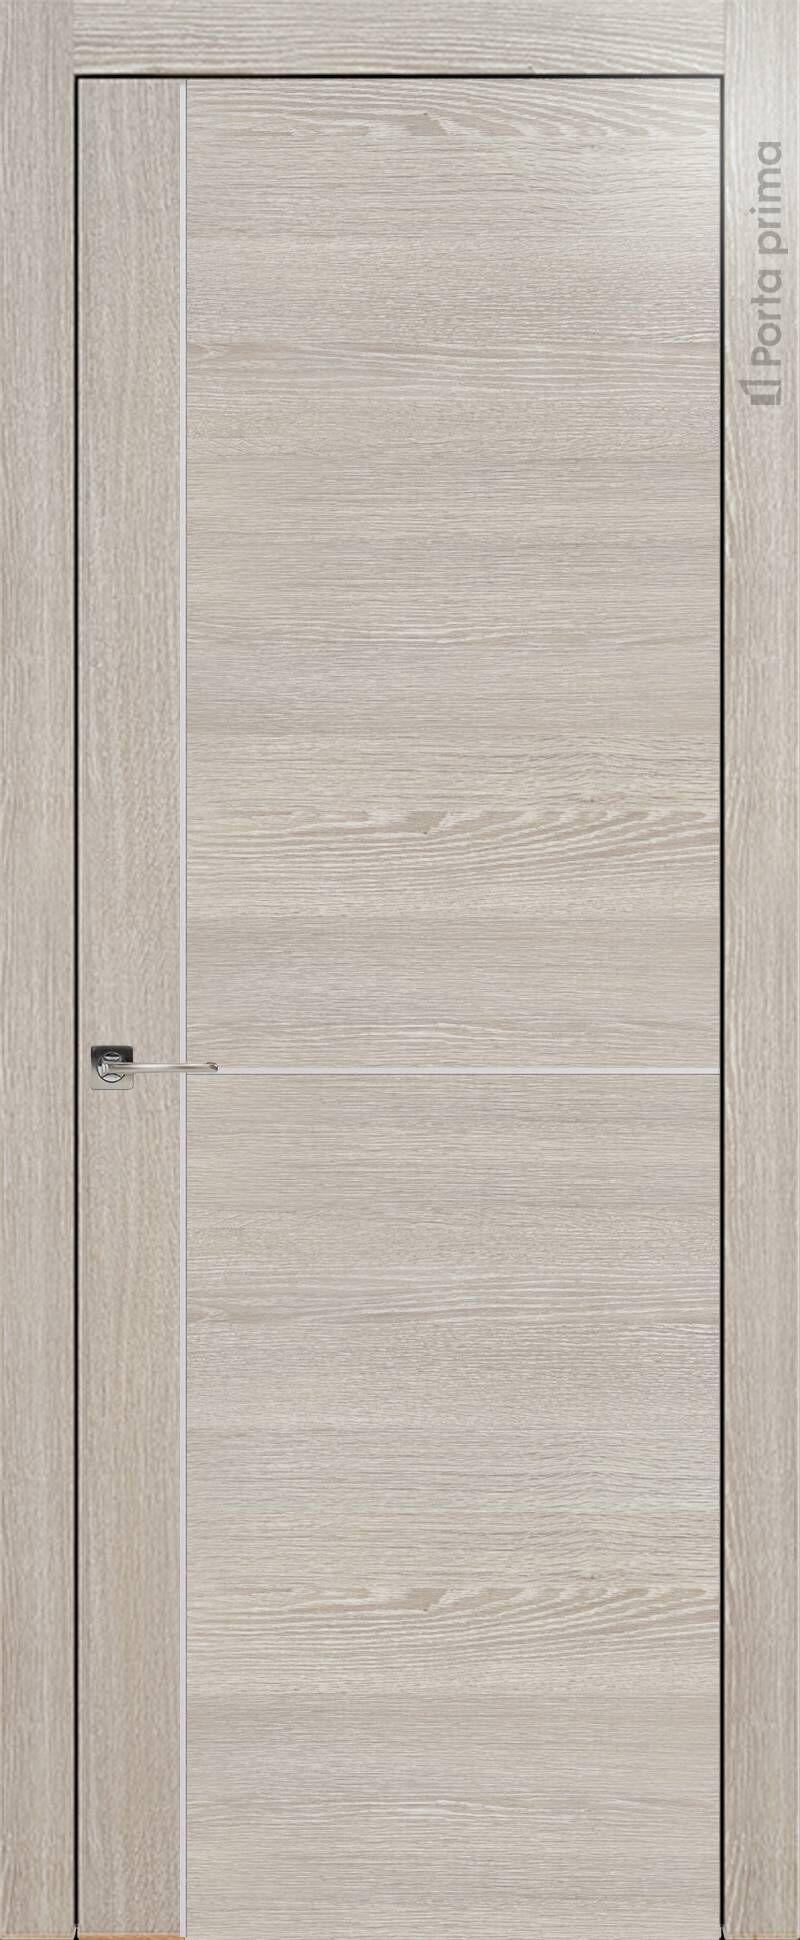 Tivoli Е-3 цвет - Серый дуб Без стекла (ДГ)